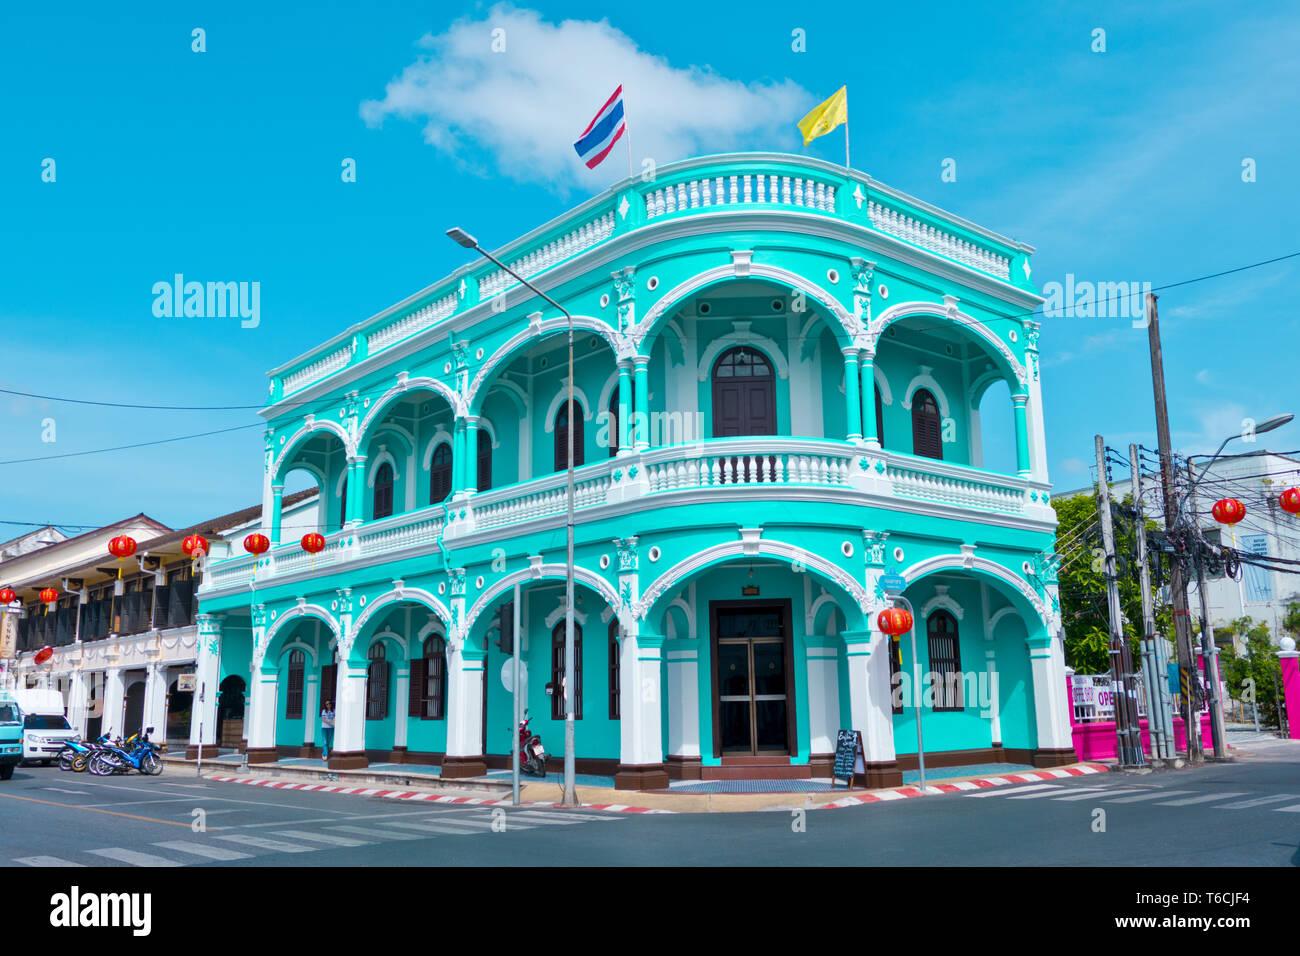 Restored Sino-Portuguese colonial architecture, corner of ebuk and Yaowarat Roads, old town, Phuket town, Thailand Stock Photo